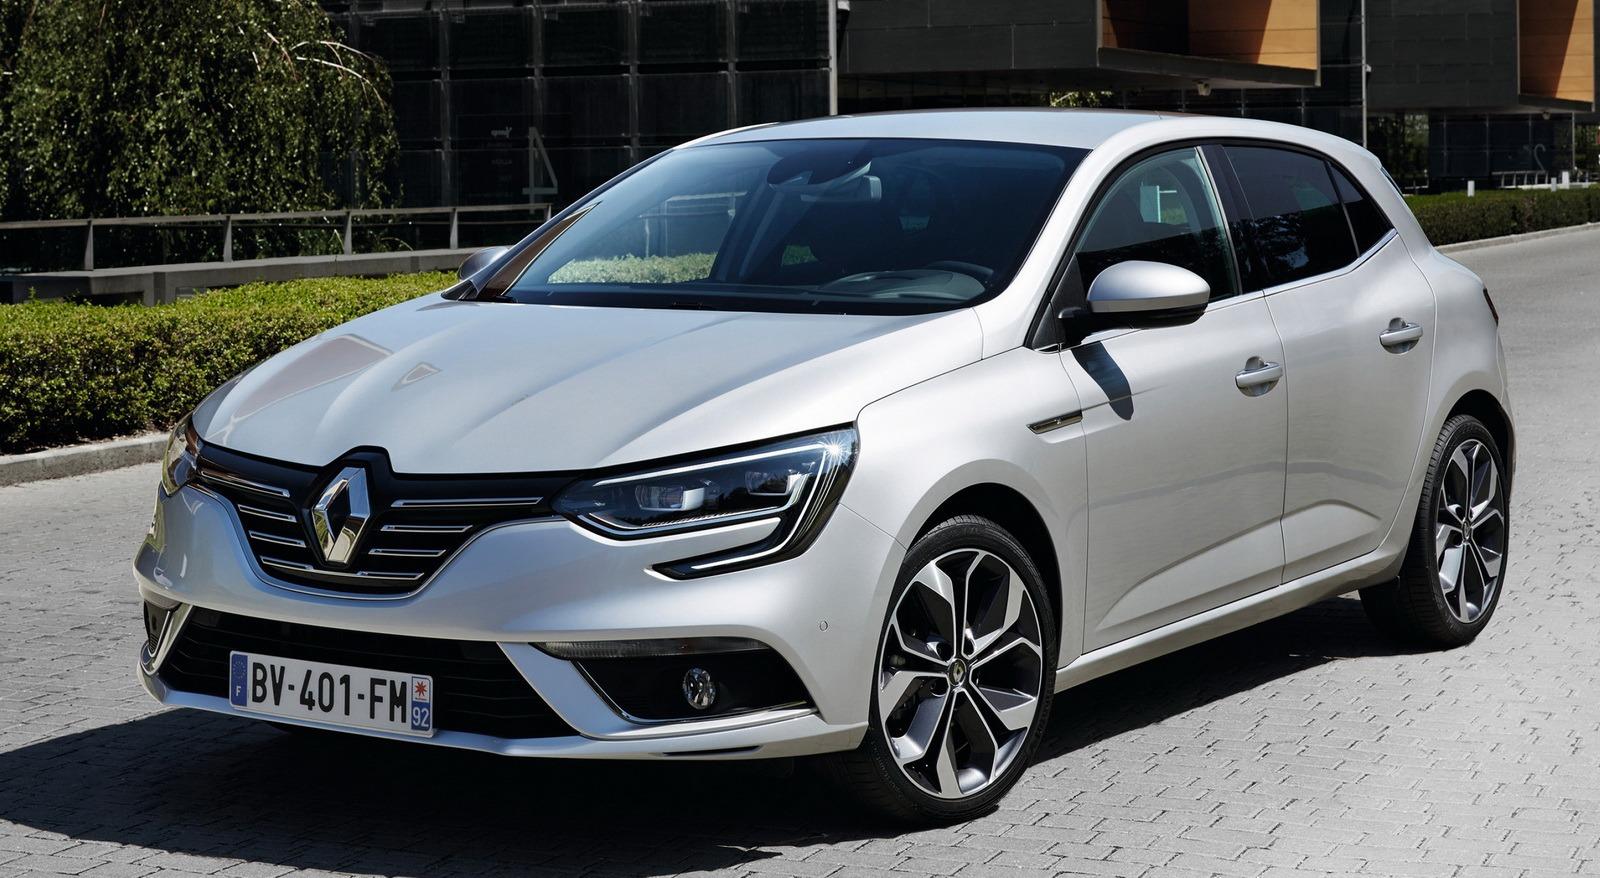 Novi turbo benzinac za Renault Megane